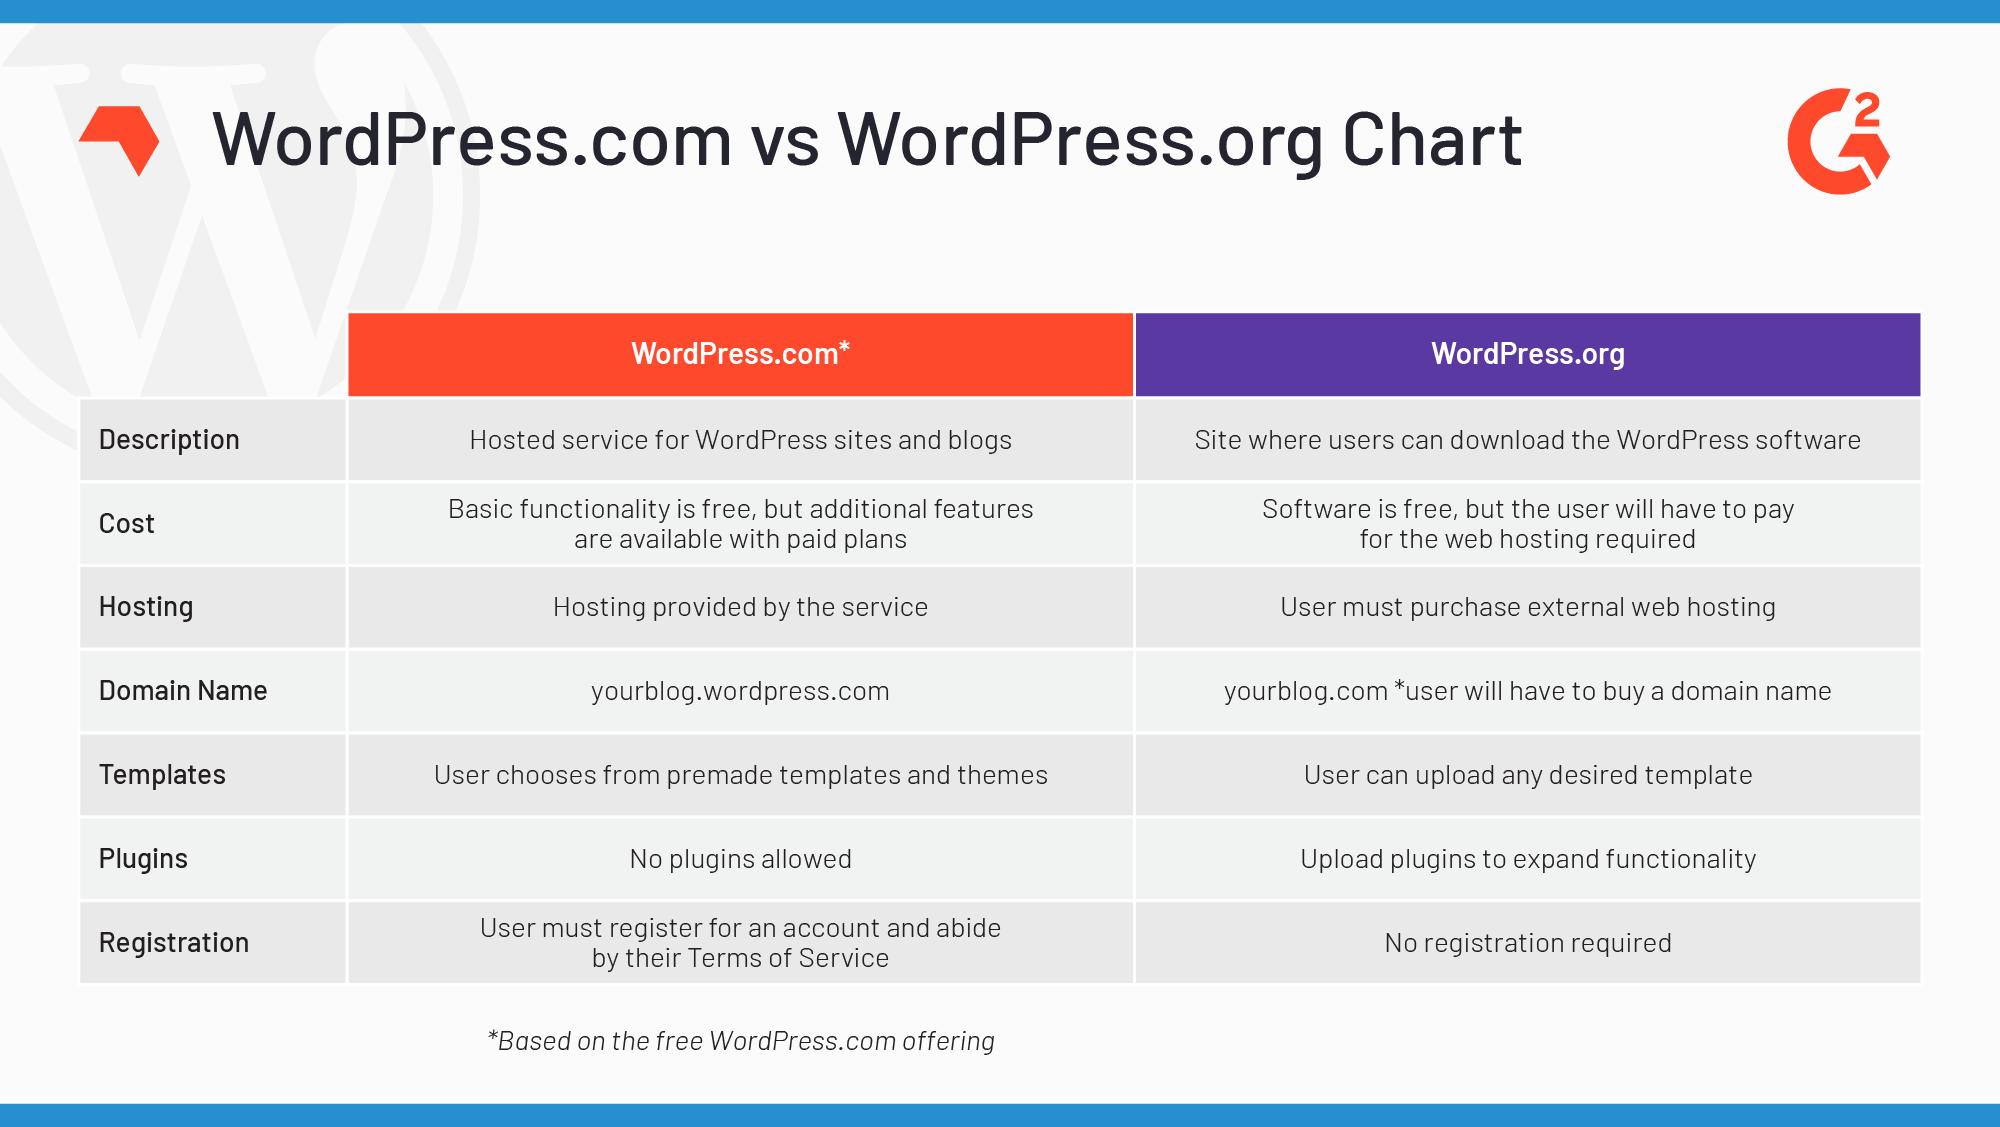 differences-between-wordpresscom-and-wordpressorg